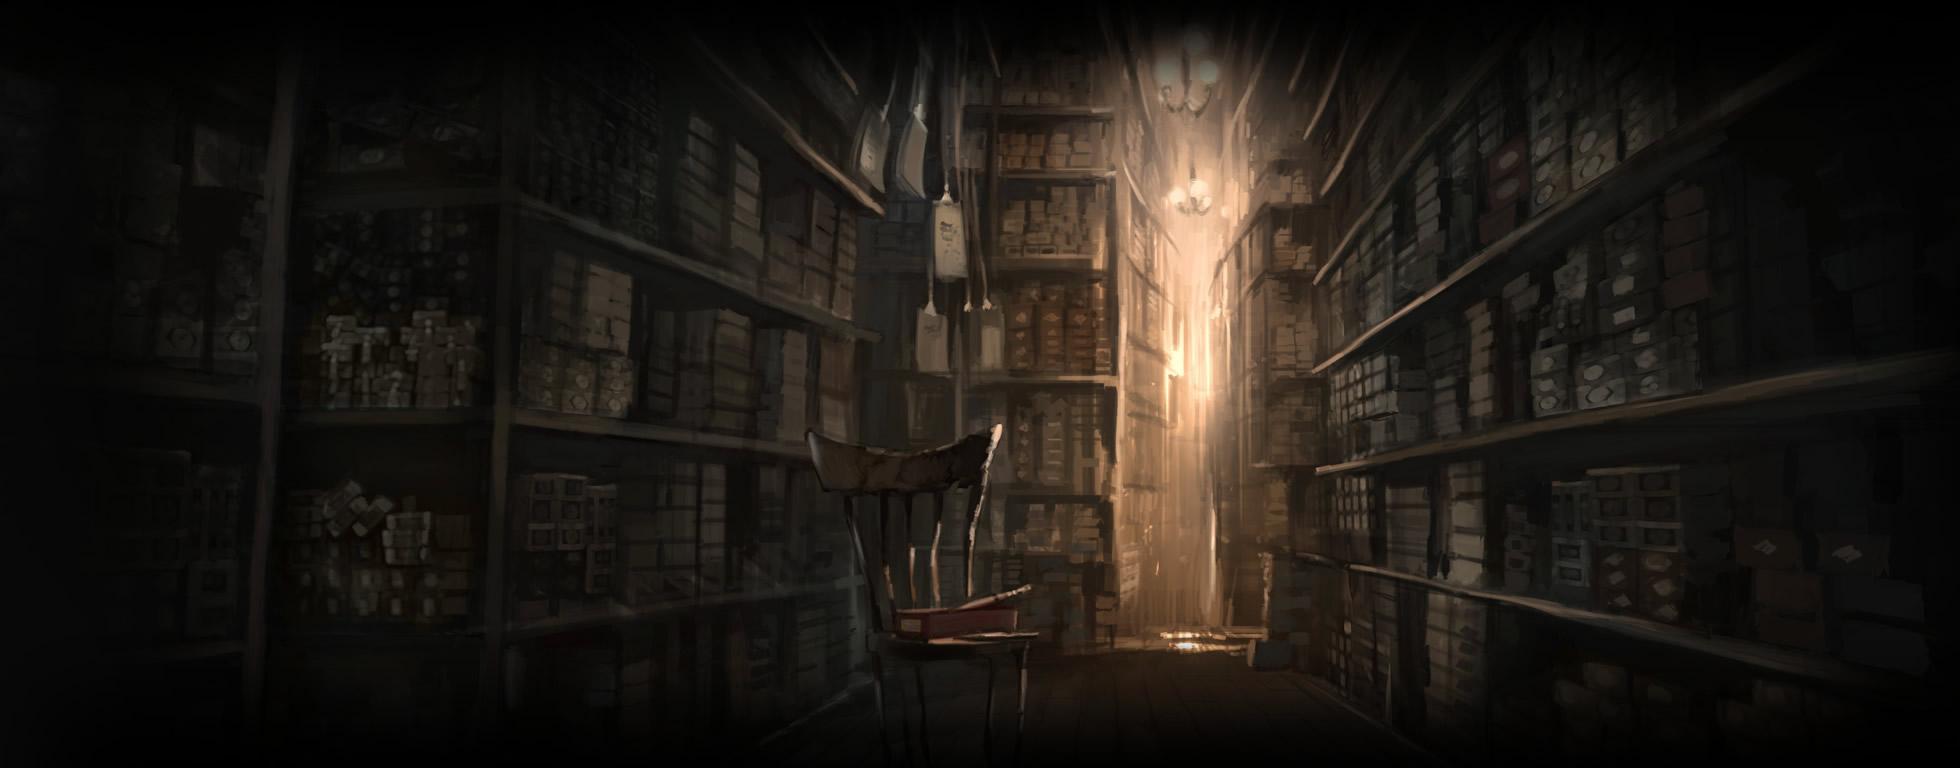 Simple Wallpaper Harry Potter Pottermore - latest?cb\u003d20120601153513  Snapshot_375438.jpg/revision/latest?cb\u003d20120601153513